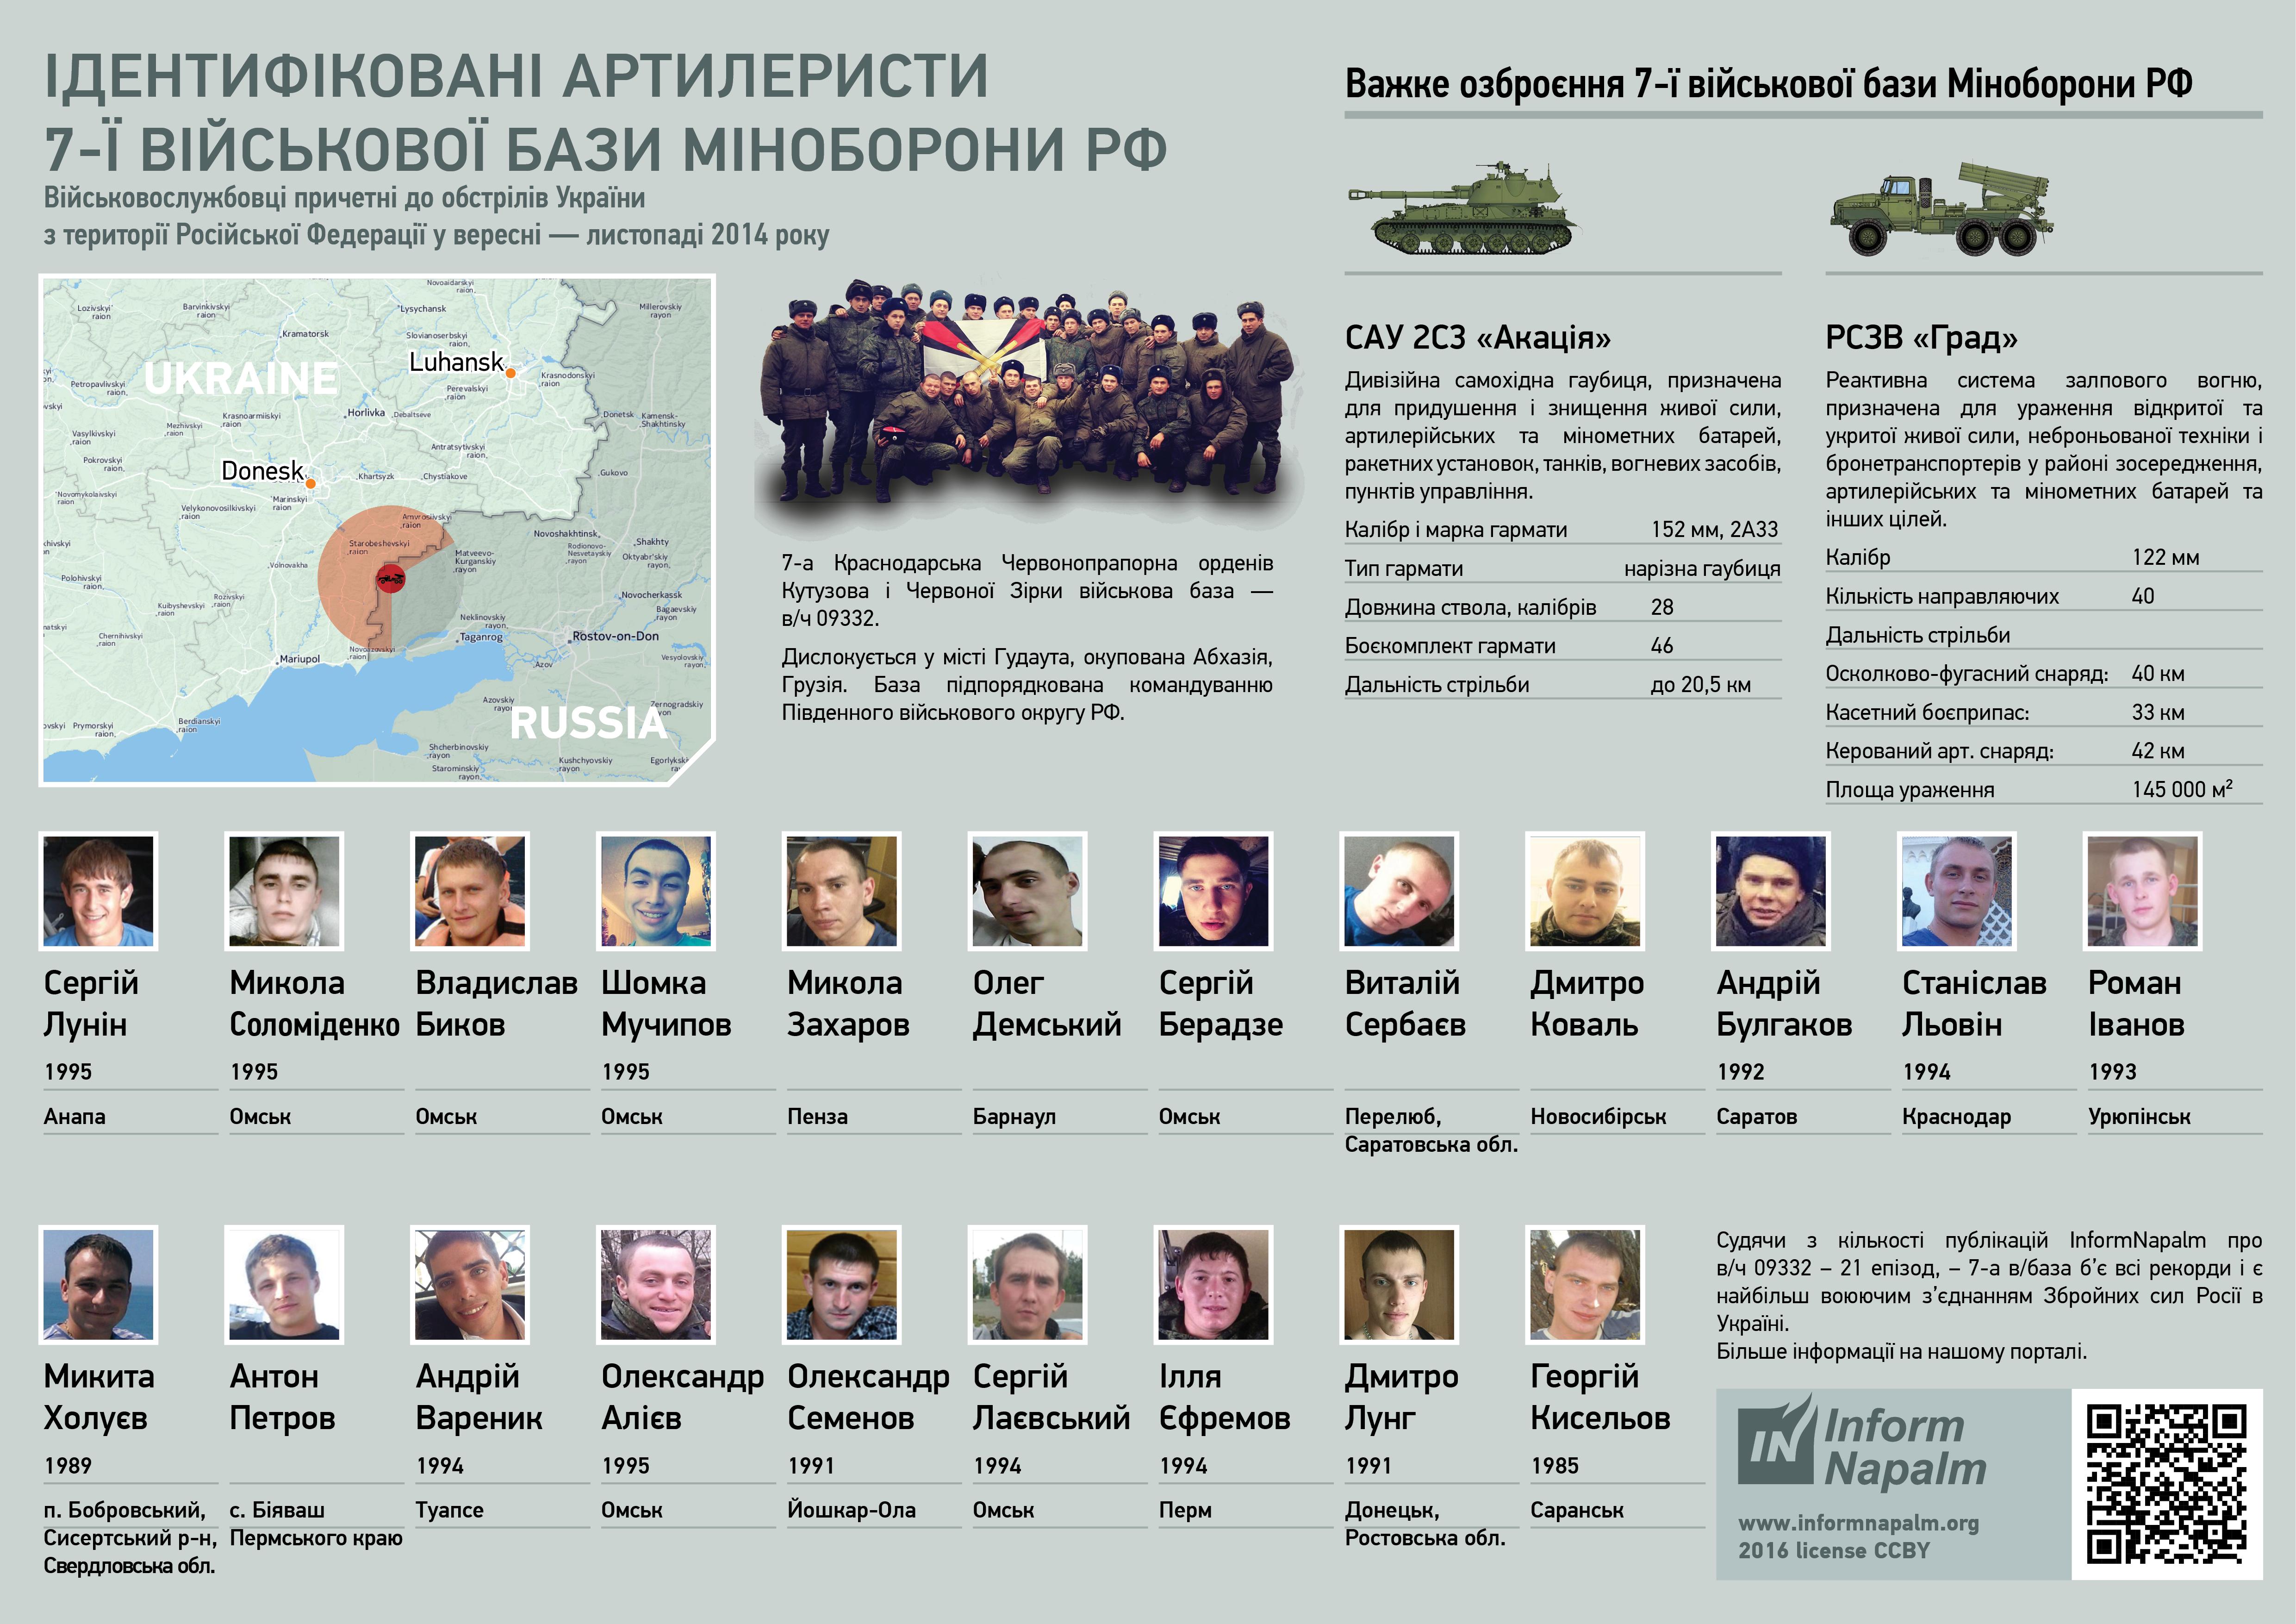 arta7-infigraphic_ukr